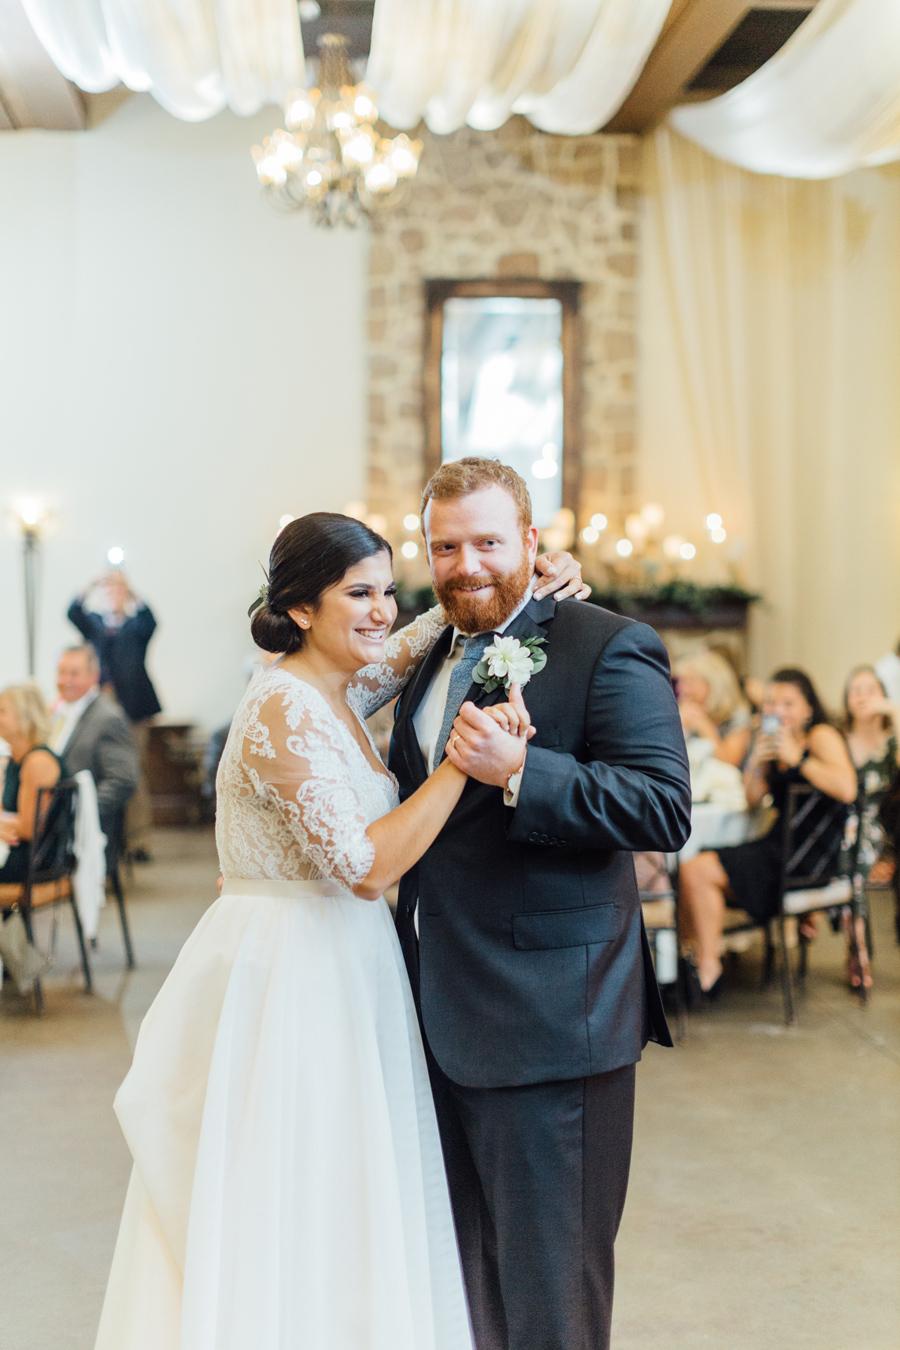 the-inn-at-leola-wedding-lancaster-pennsylvania-wedding-photographer-rebeka-viola-photograhy (108).jpg